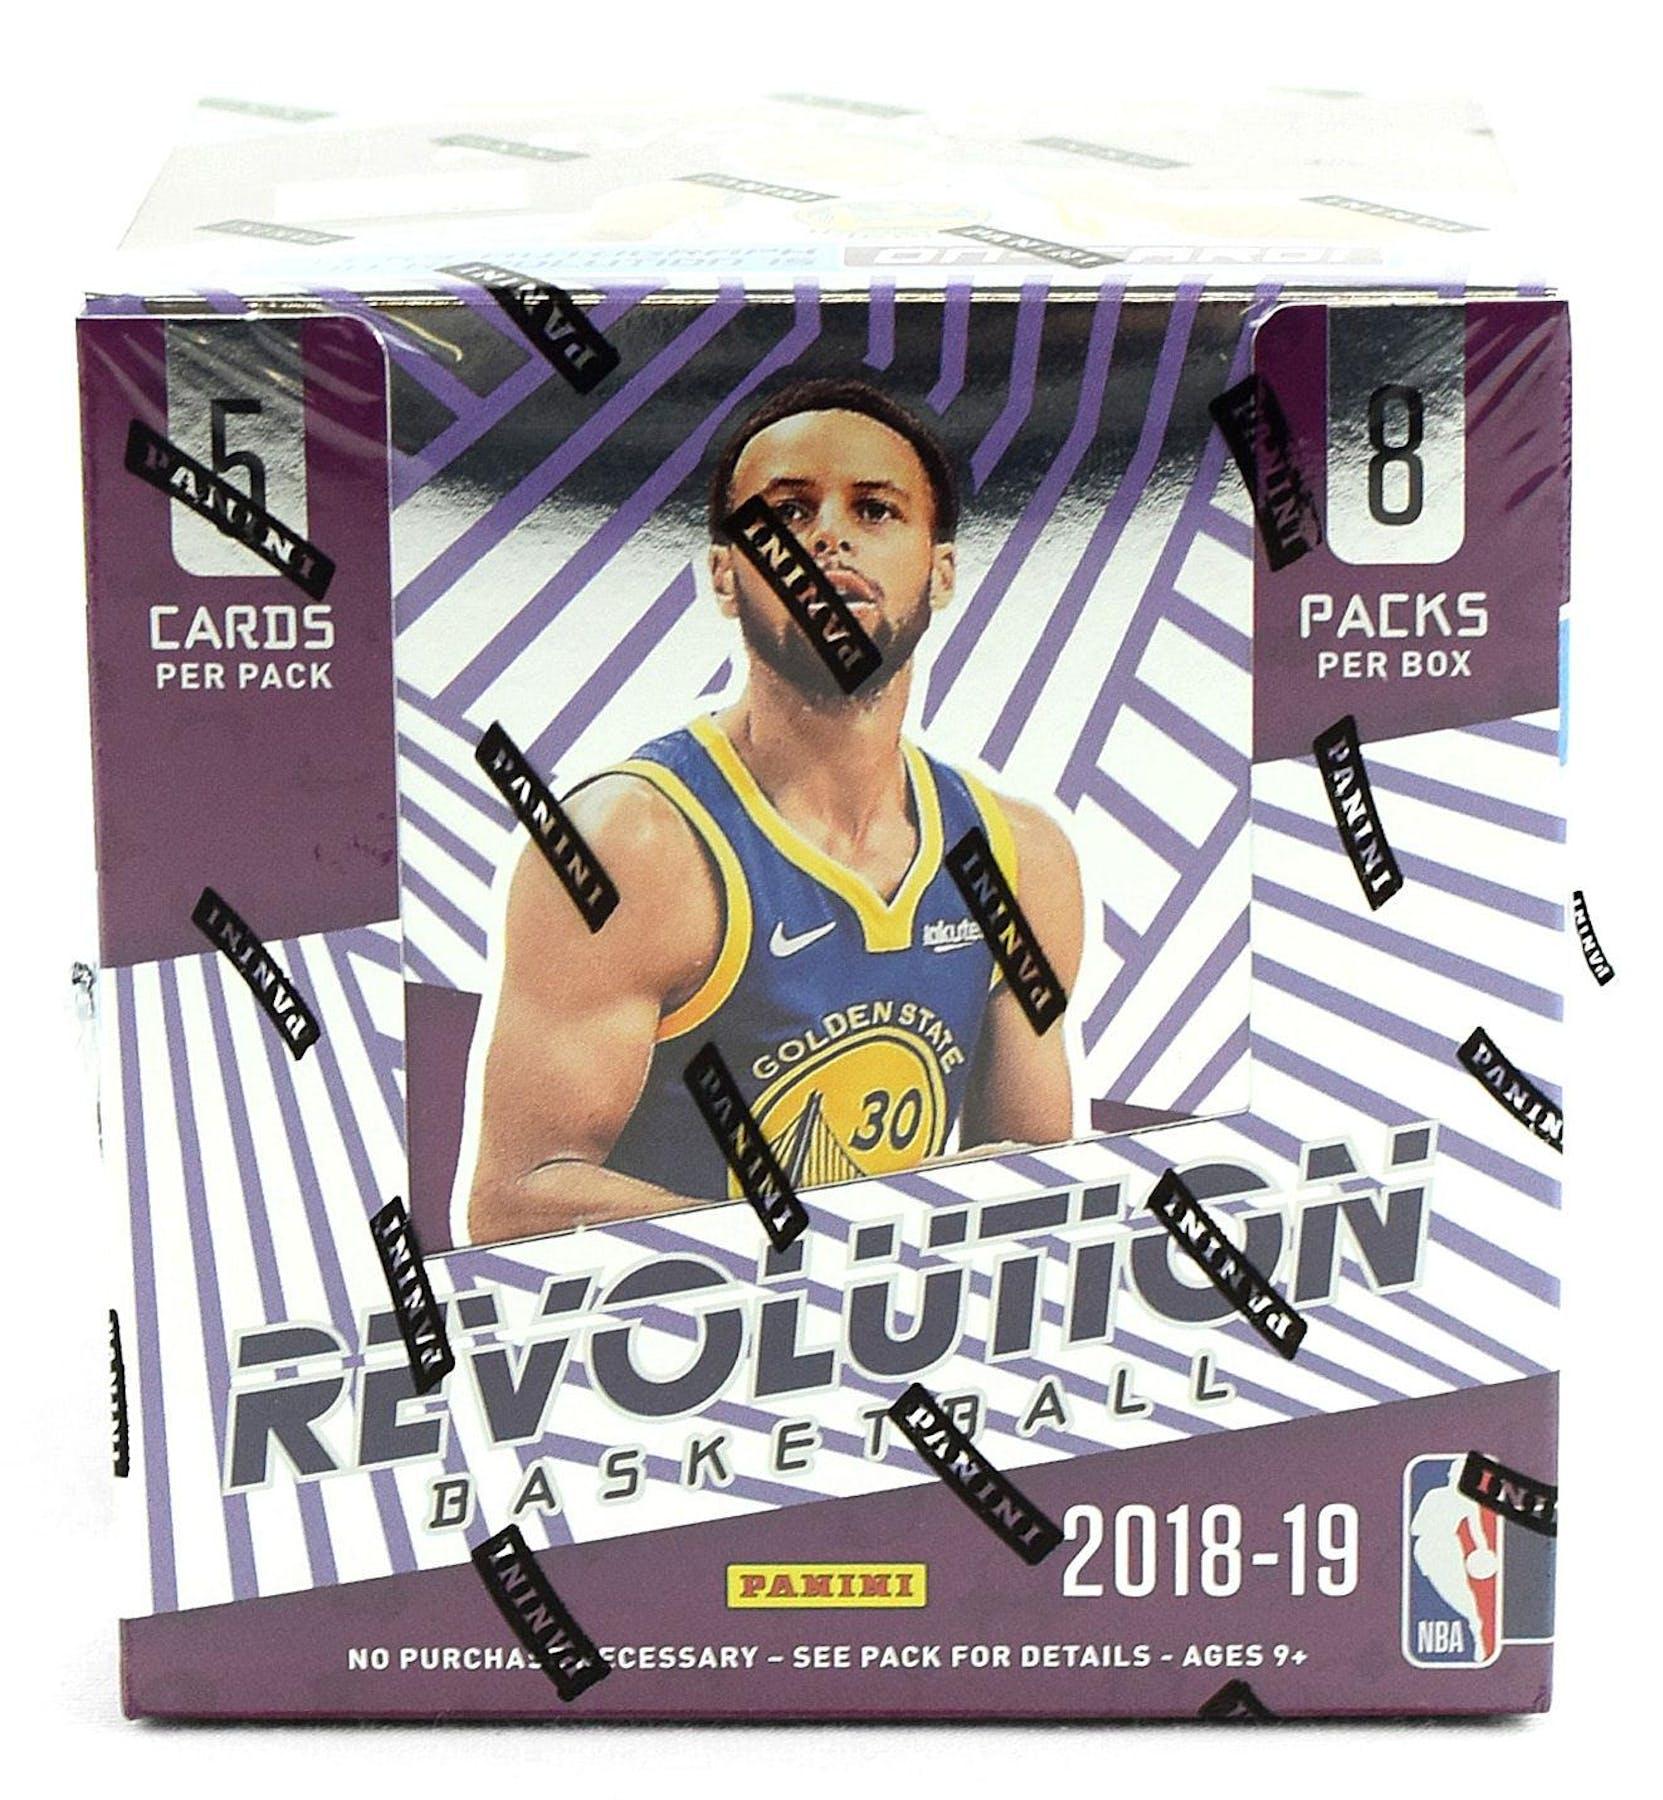 2018 19 Panini Nba Hoops Basketball Hobby Box: 2018/19 Panini Revolution Basketball Hobby Box